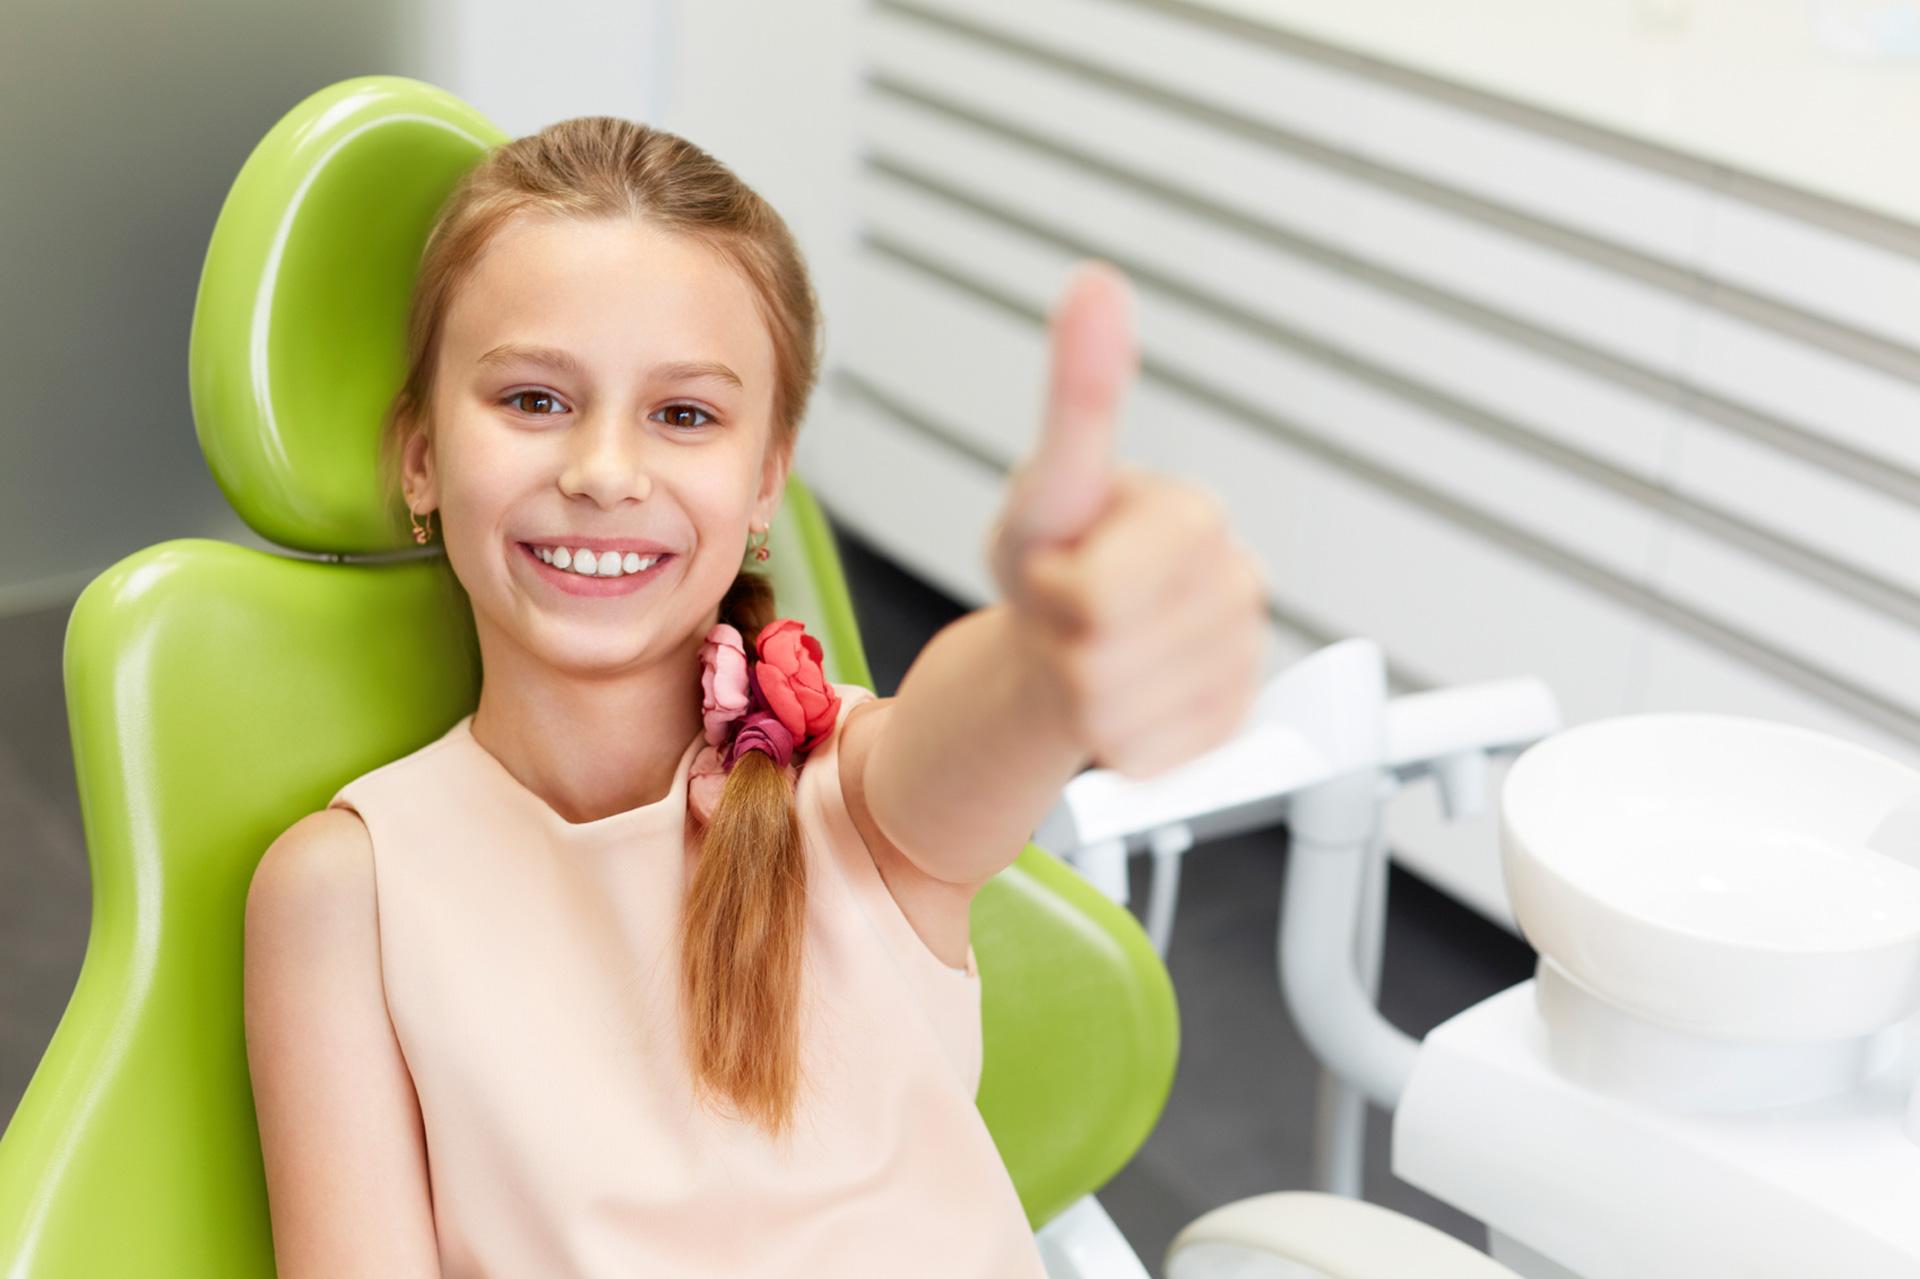 Smiling girl in Dental chair